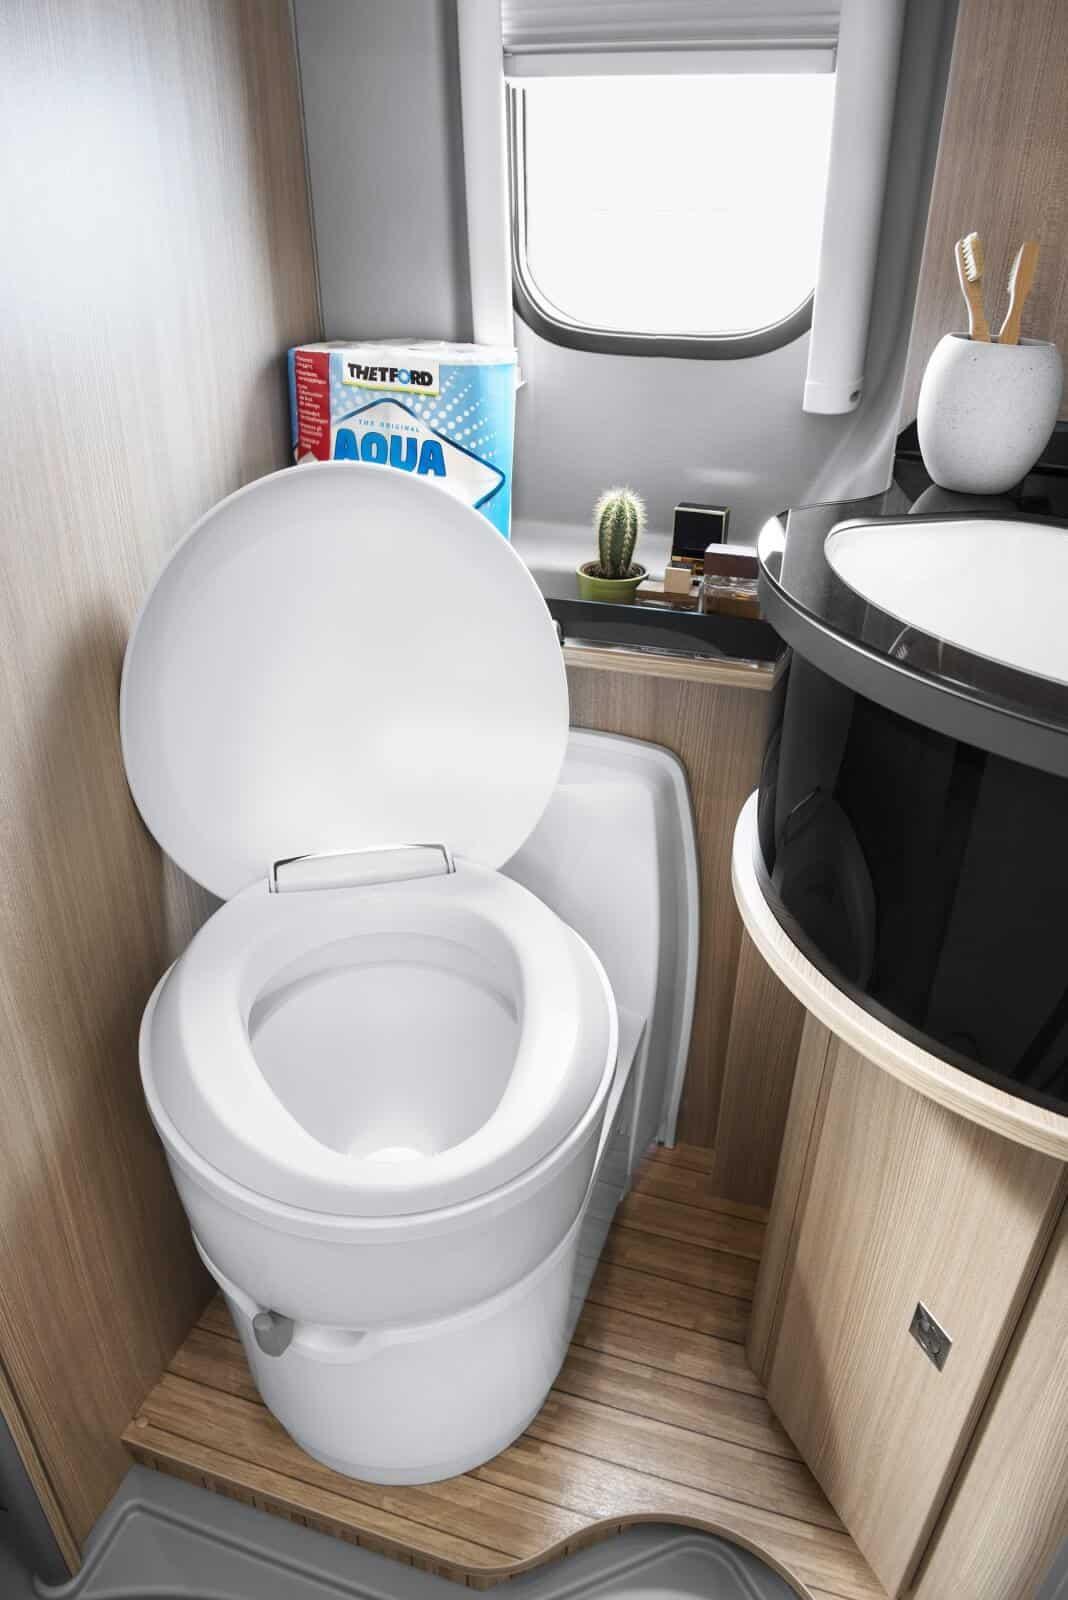 10 Best RV Toilets – 9